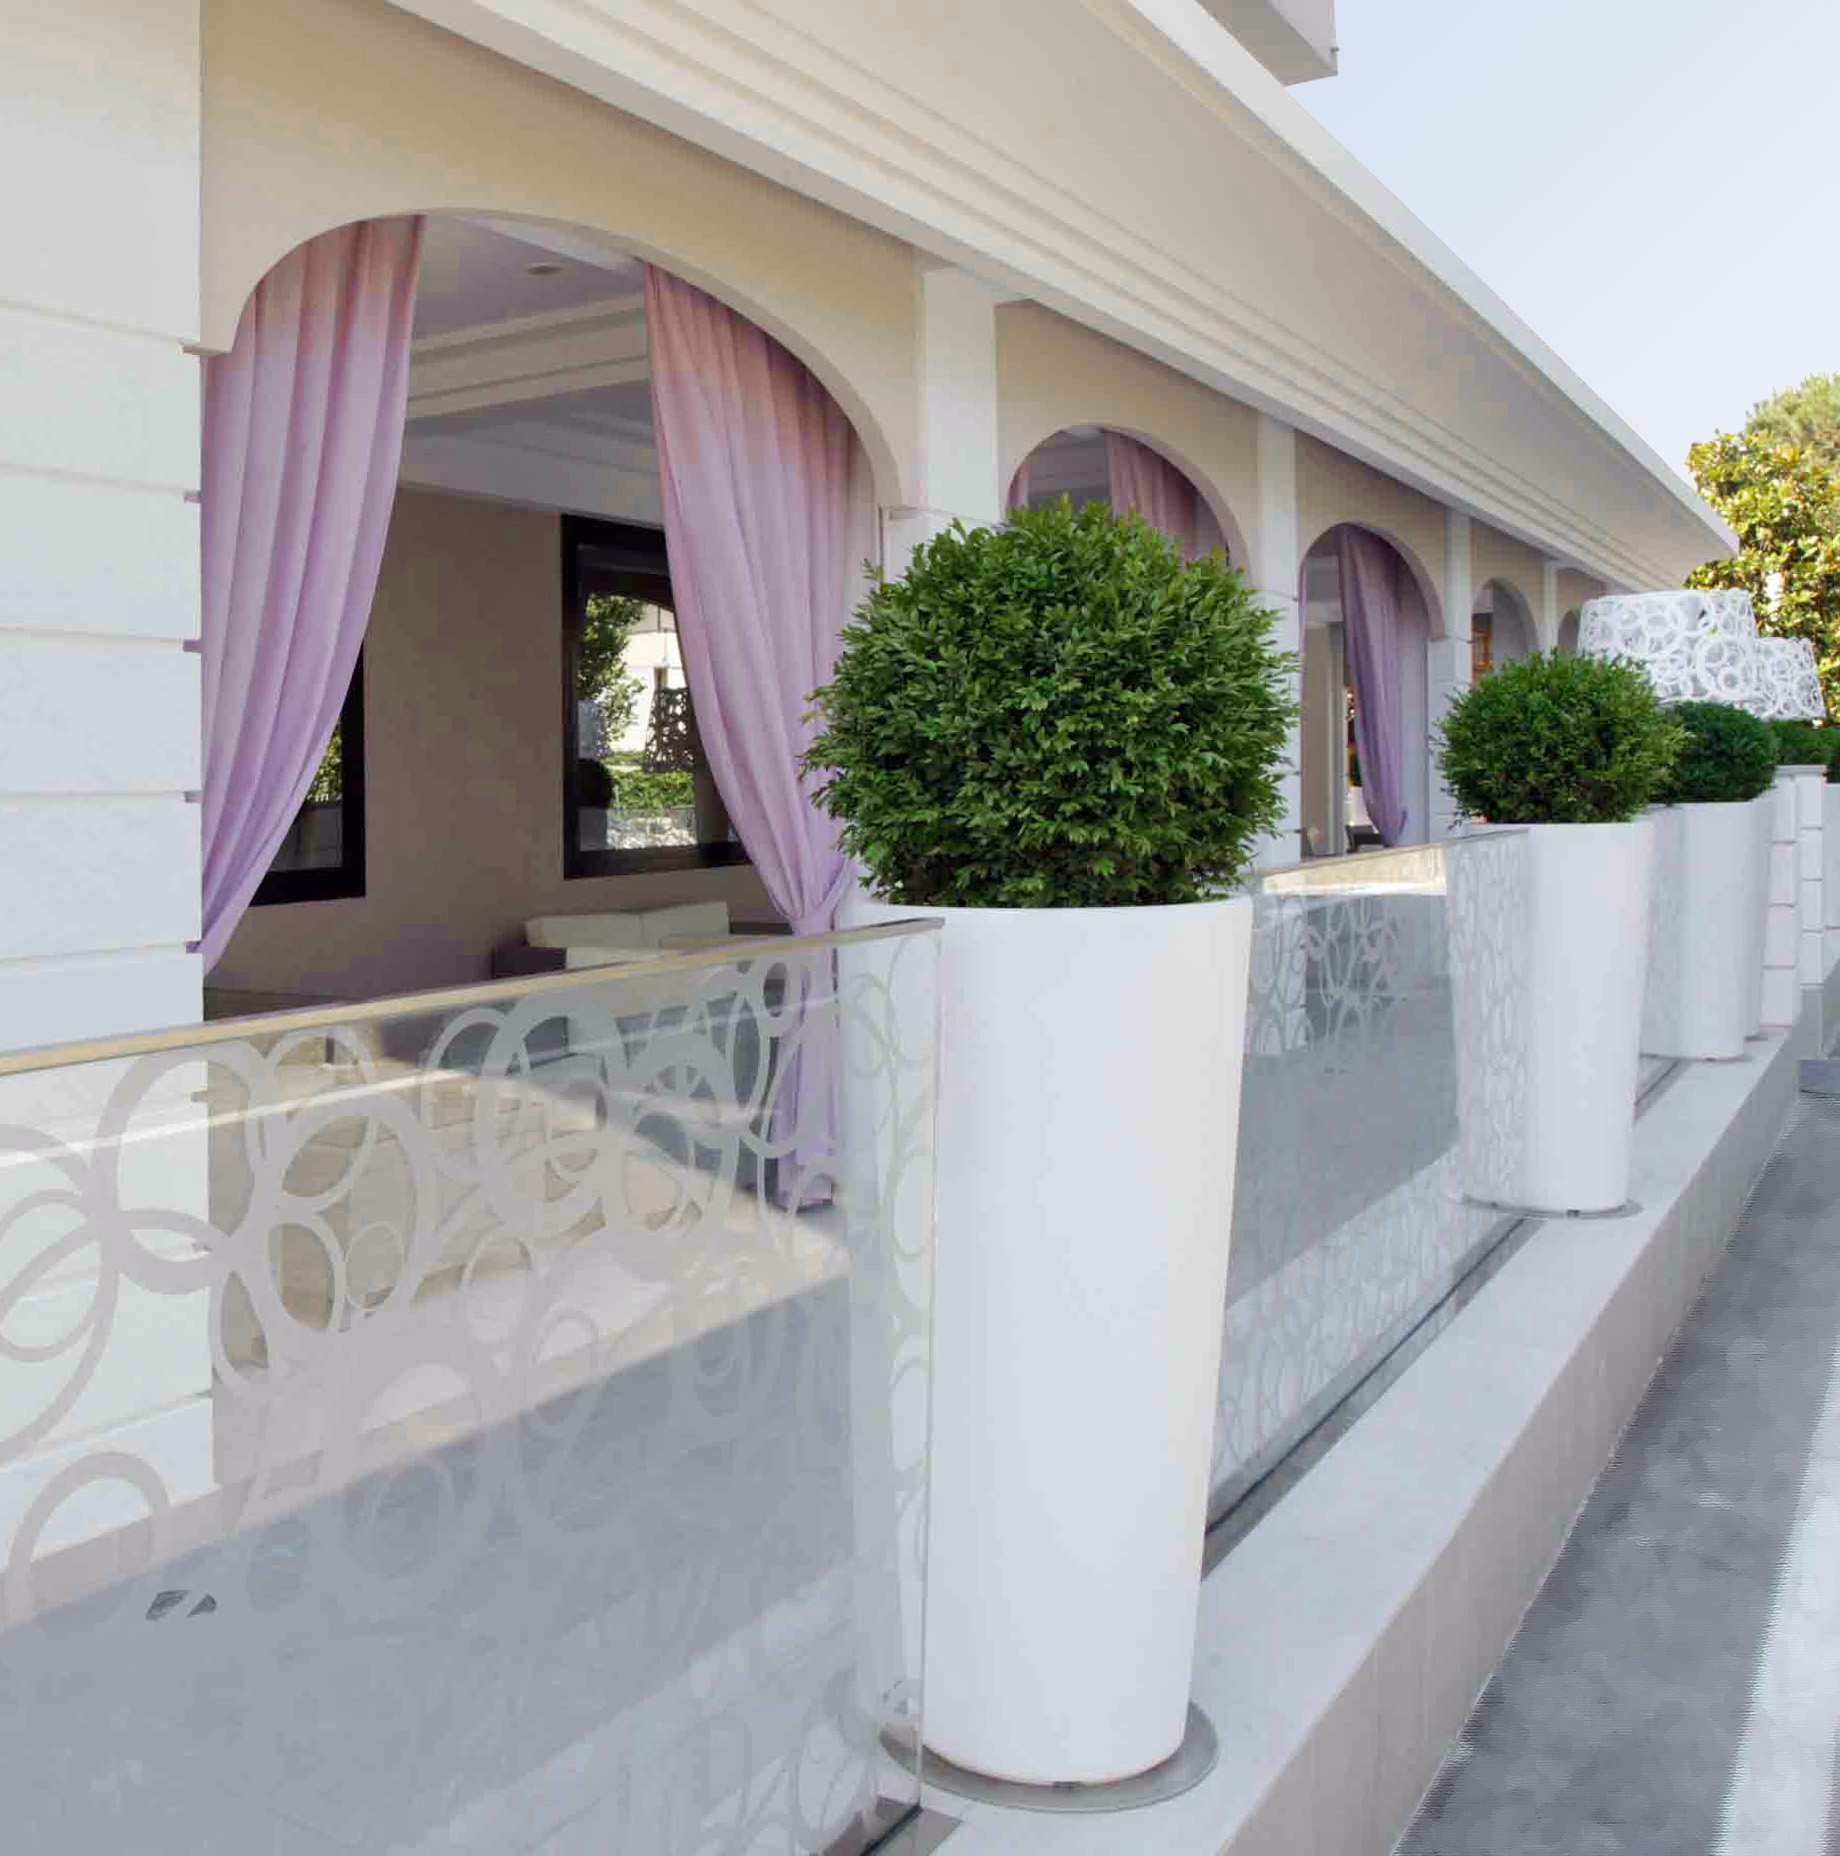 Hotel Villa Paola Bellaria-Igea Marina 02 | Studio Materia